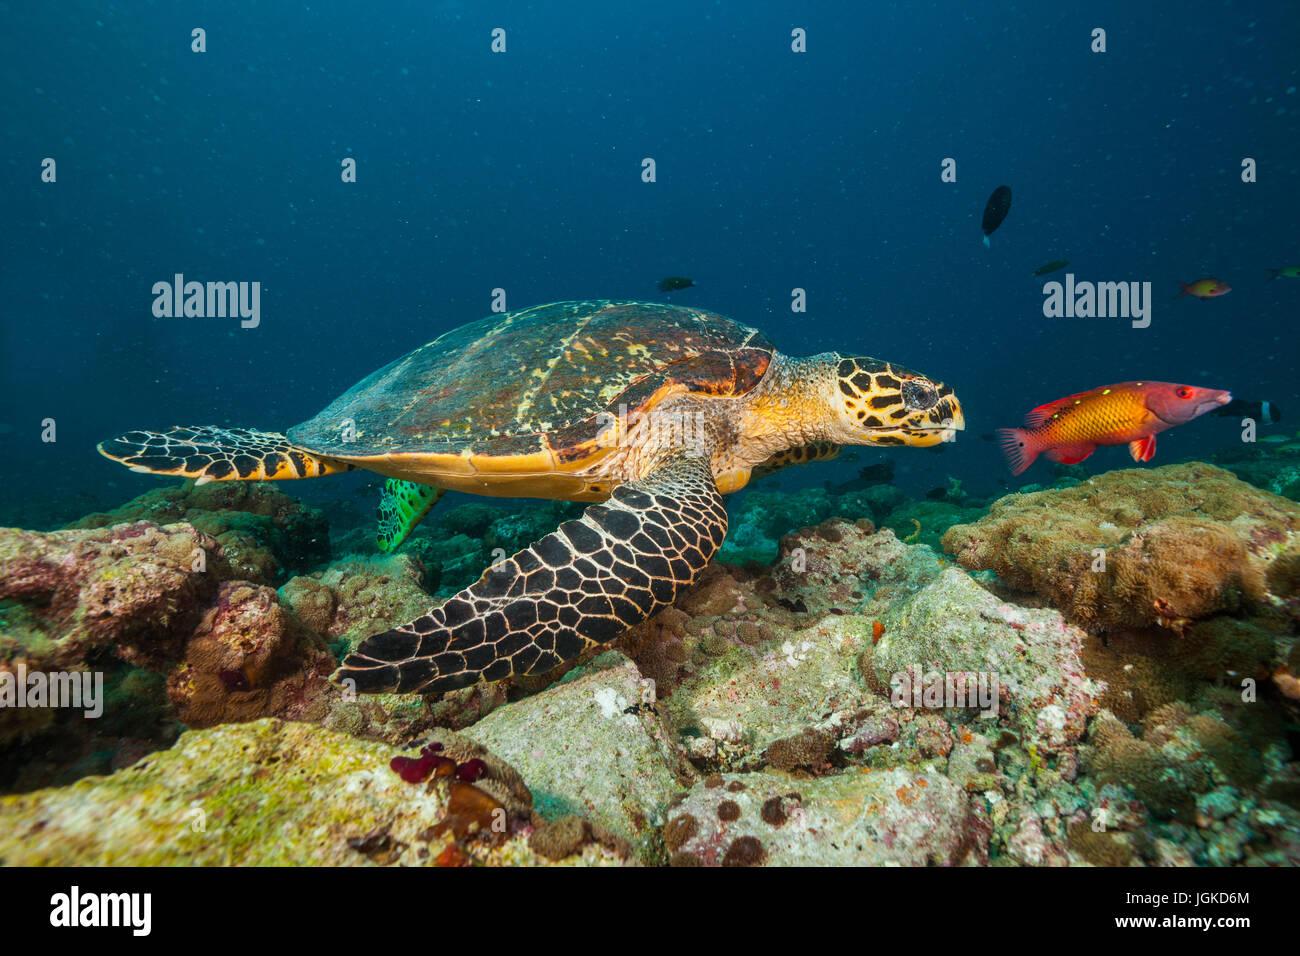 Maldivian hawkbill turtle exploring coral reef. Underwater life and ocean ecosystem - Stock Image